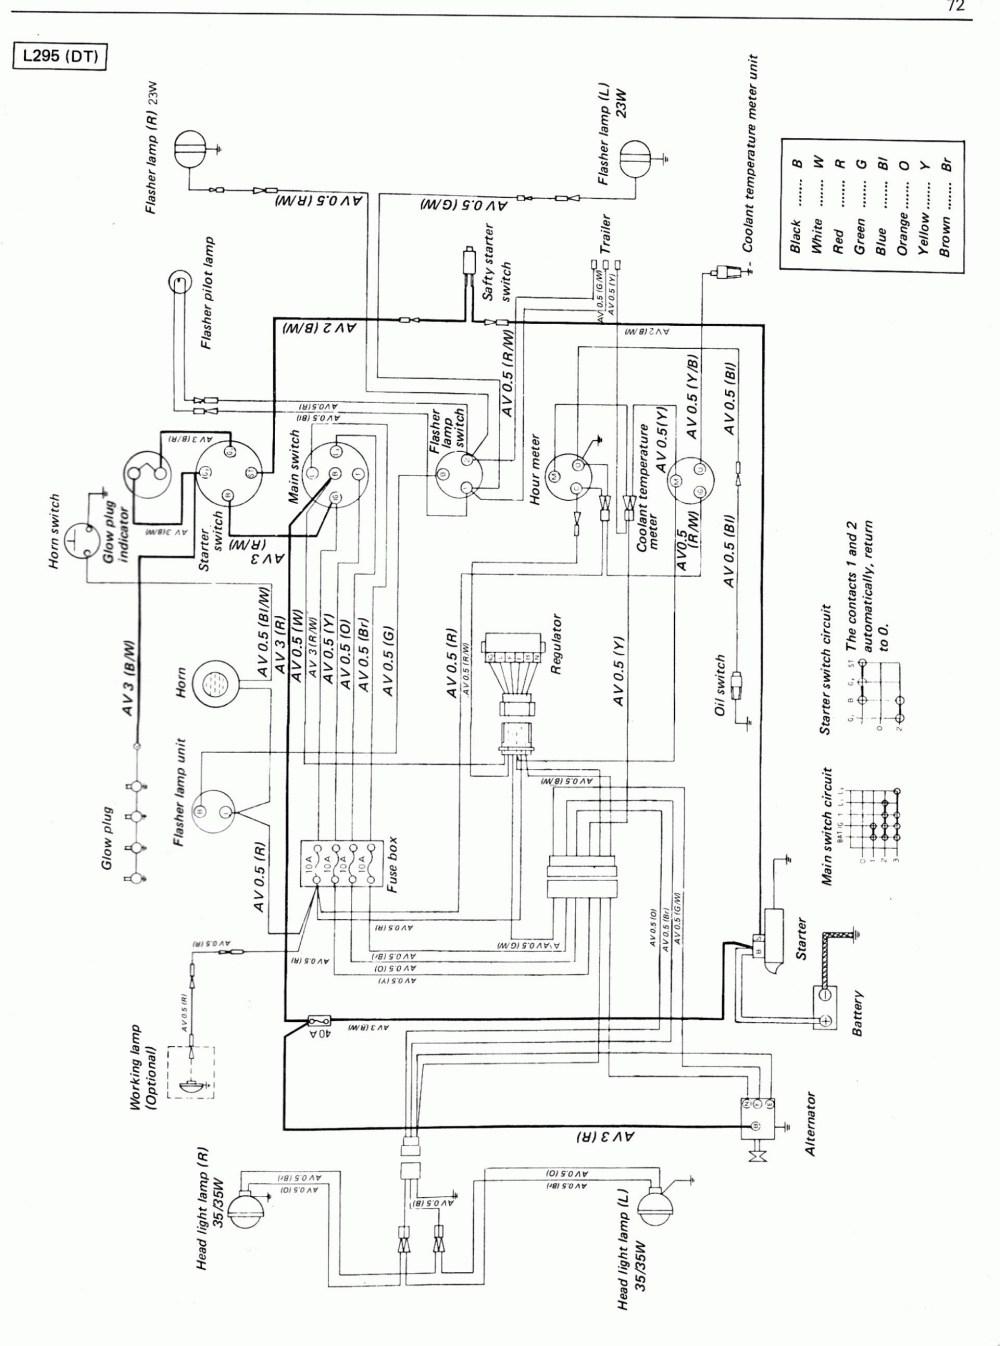 medium resolution of kubota f2400 ignition switch wiring diagram wiring diagram kubota wiring diagram pdf